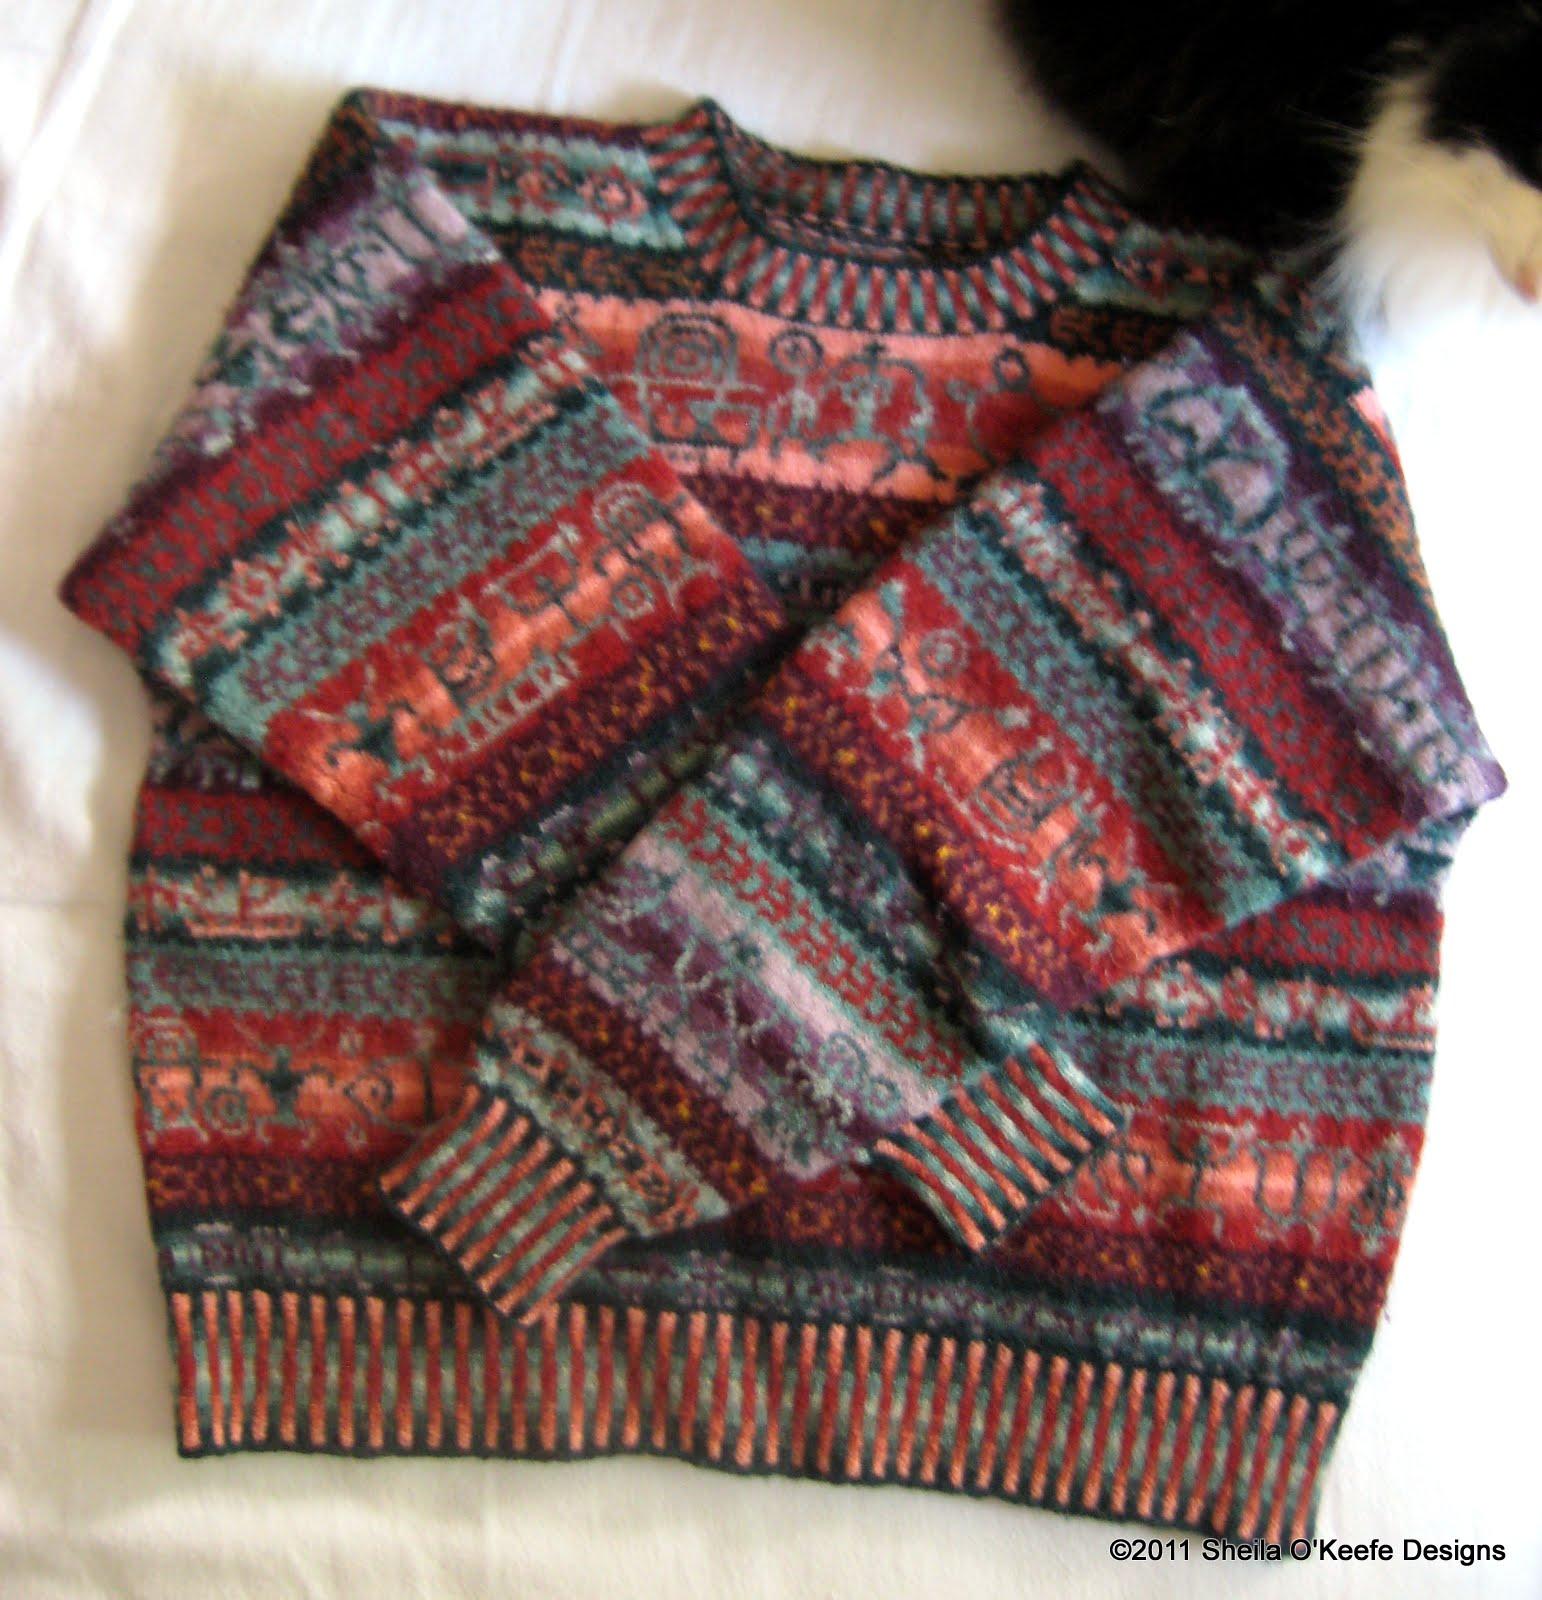 Sheila O'Keefe Designs: Hawaiian Petroglyph Sweater